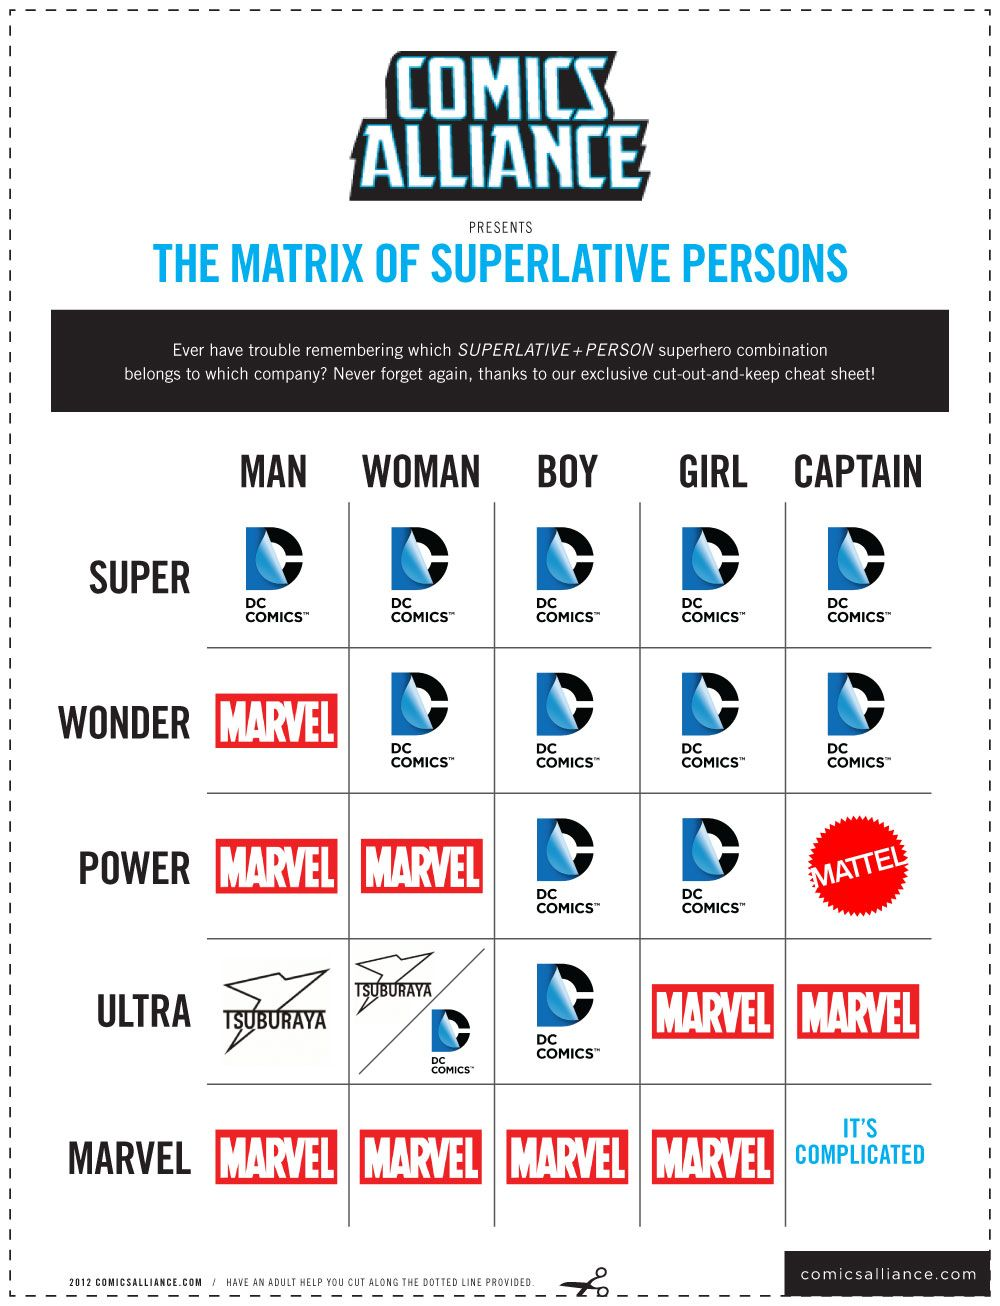 ComicsAlliance Presents: The Matrix of Superlative Persons [Chart] - ComicsAlliance | Comic book culture, news, humor, commentary, and reviews